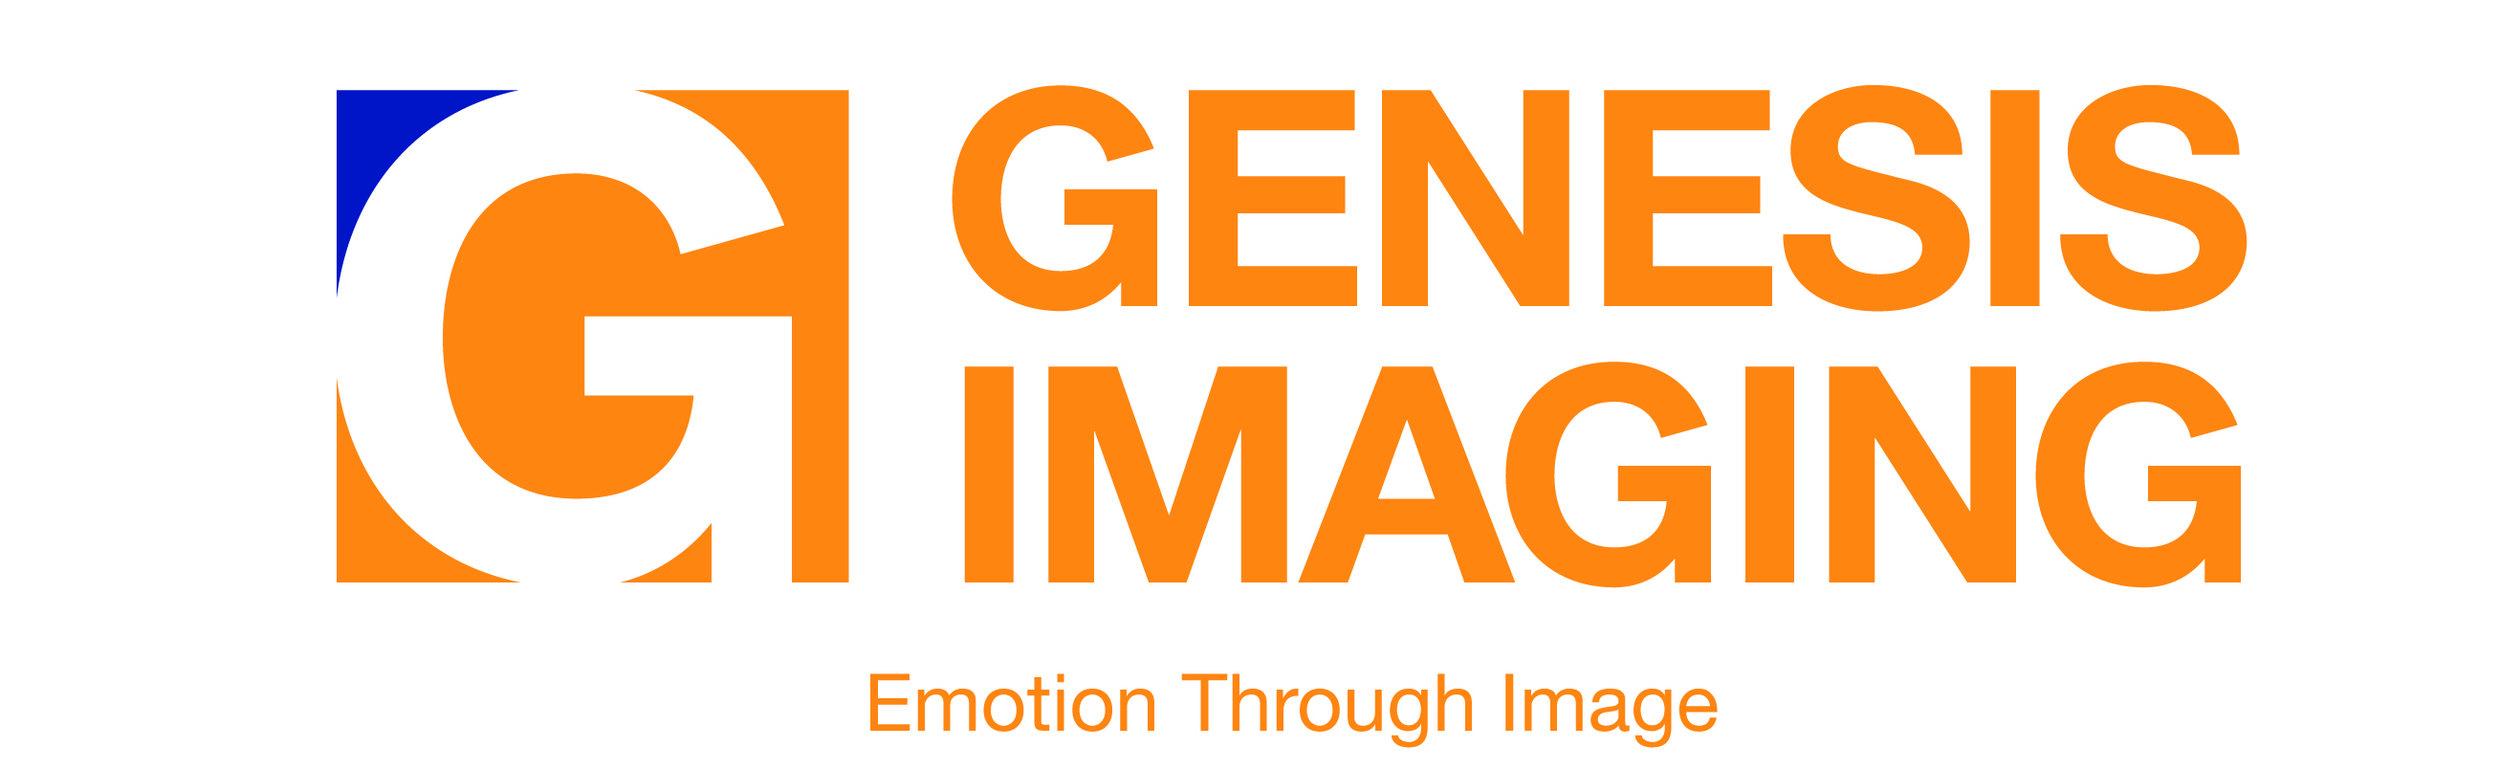 GenesisImagingRGB - with strapline.jpg